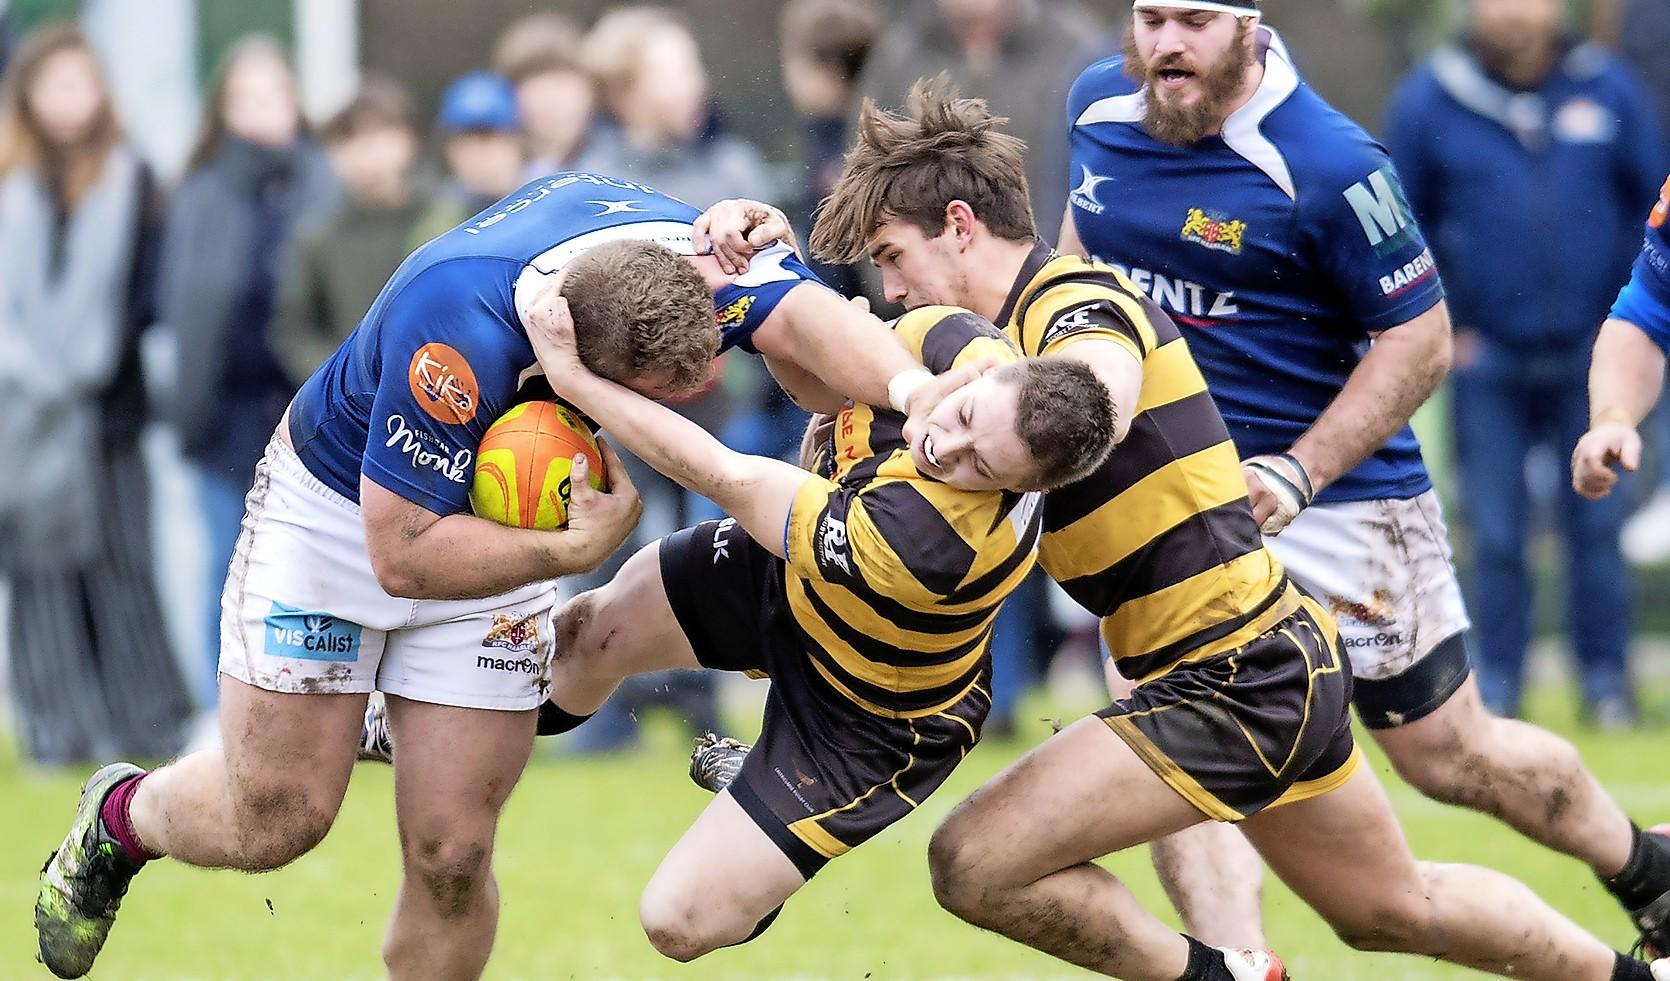 Rugbyers Haarlem flinke stap dichterbij titel